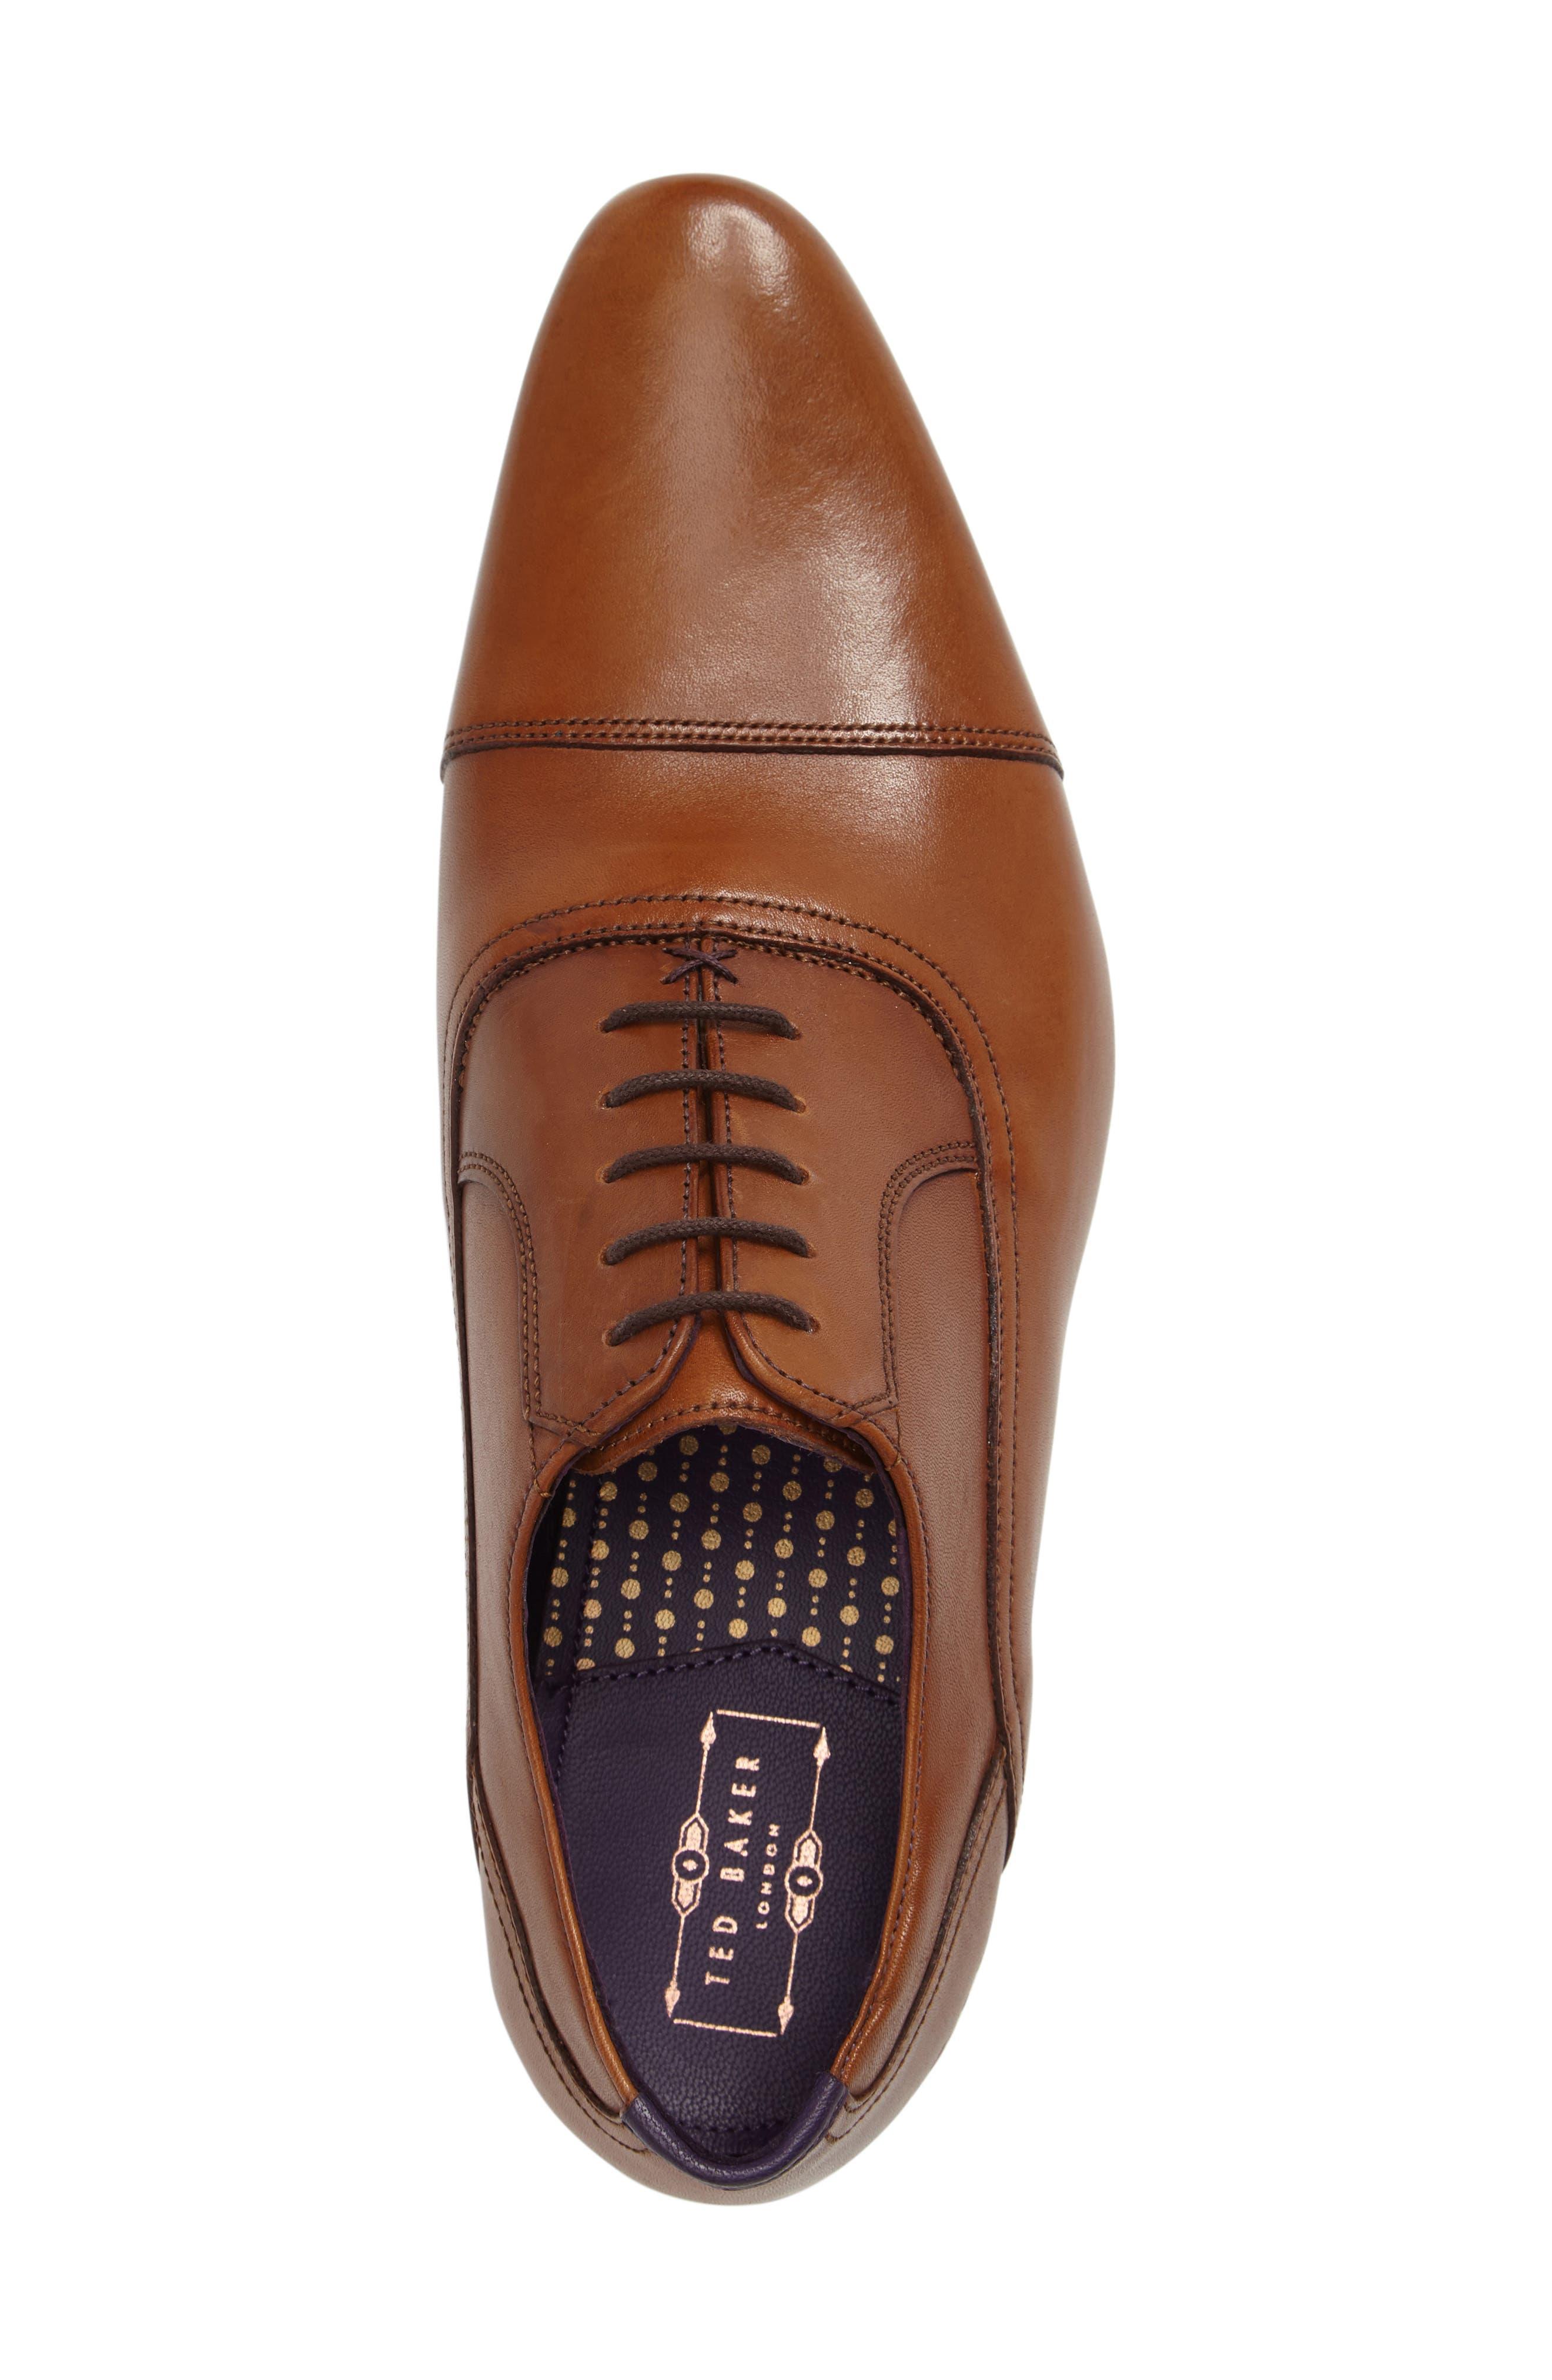 Rogrr 3 Cap Toe Oxford,                             Alternate thumbnail 3, color,                             Tan Leather